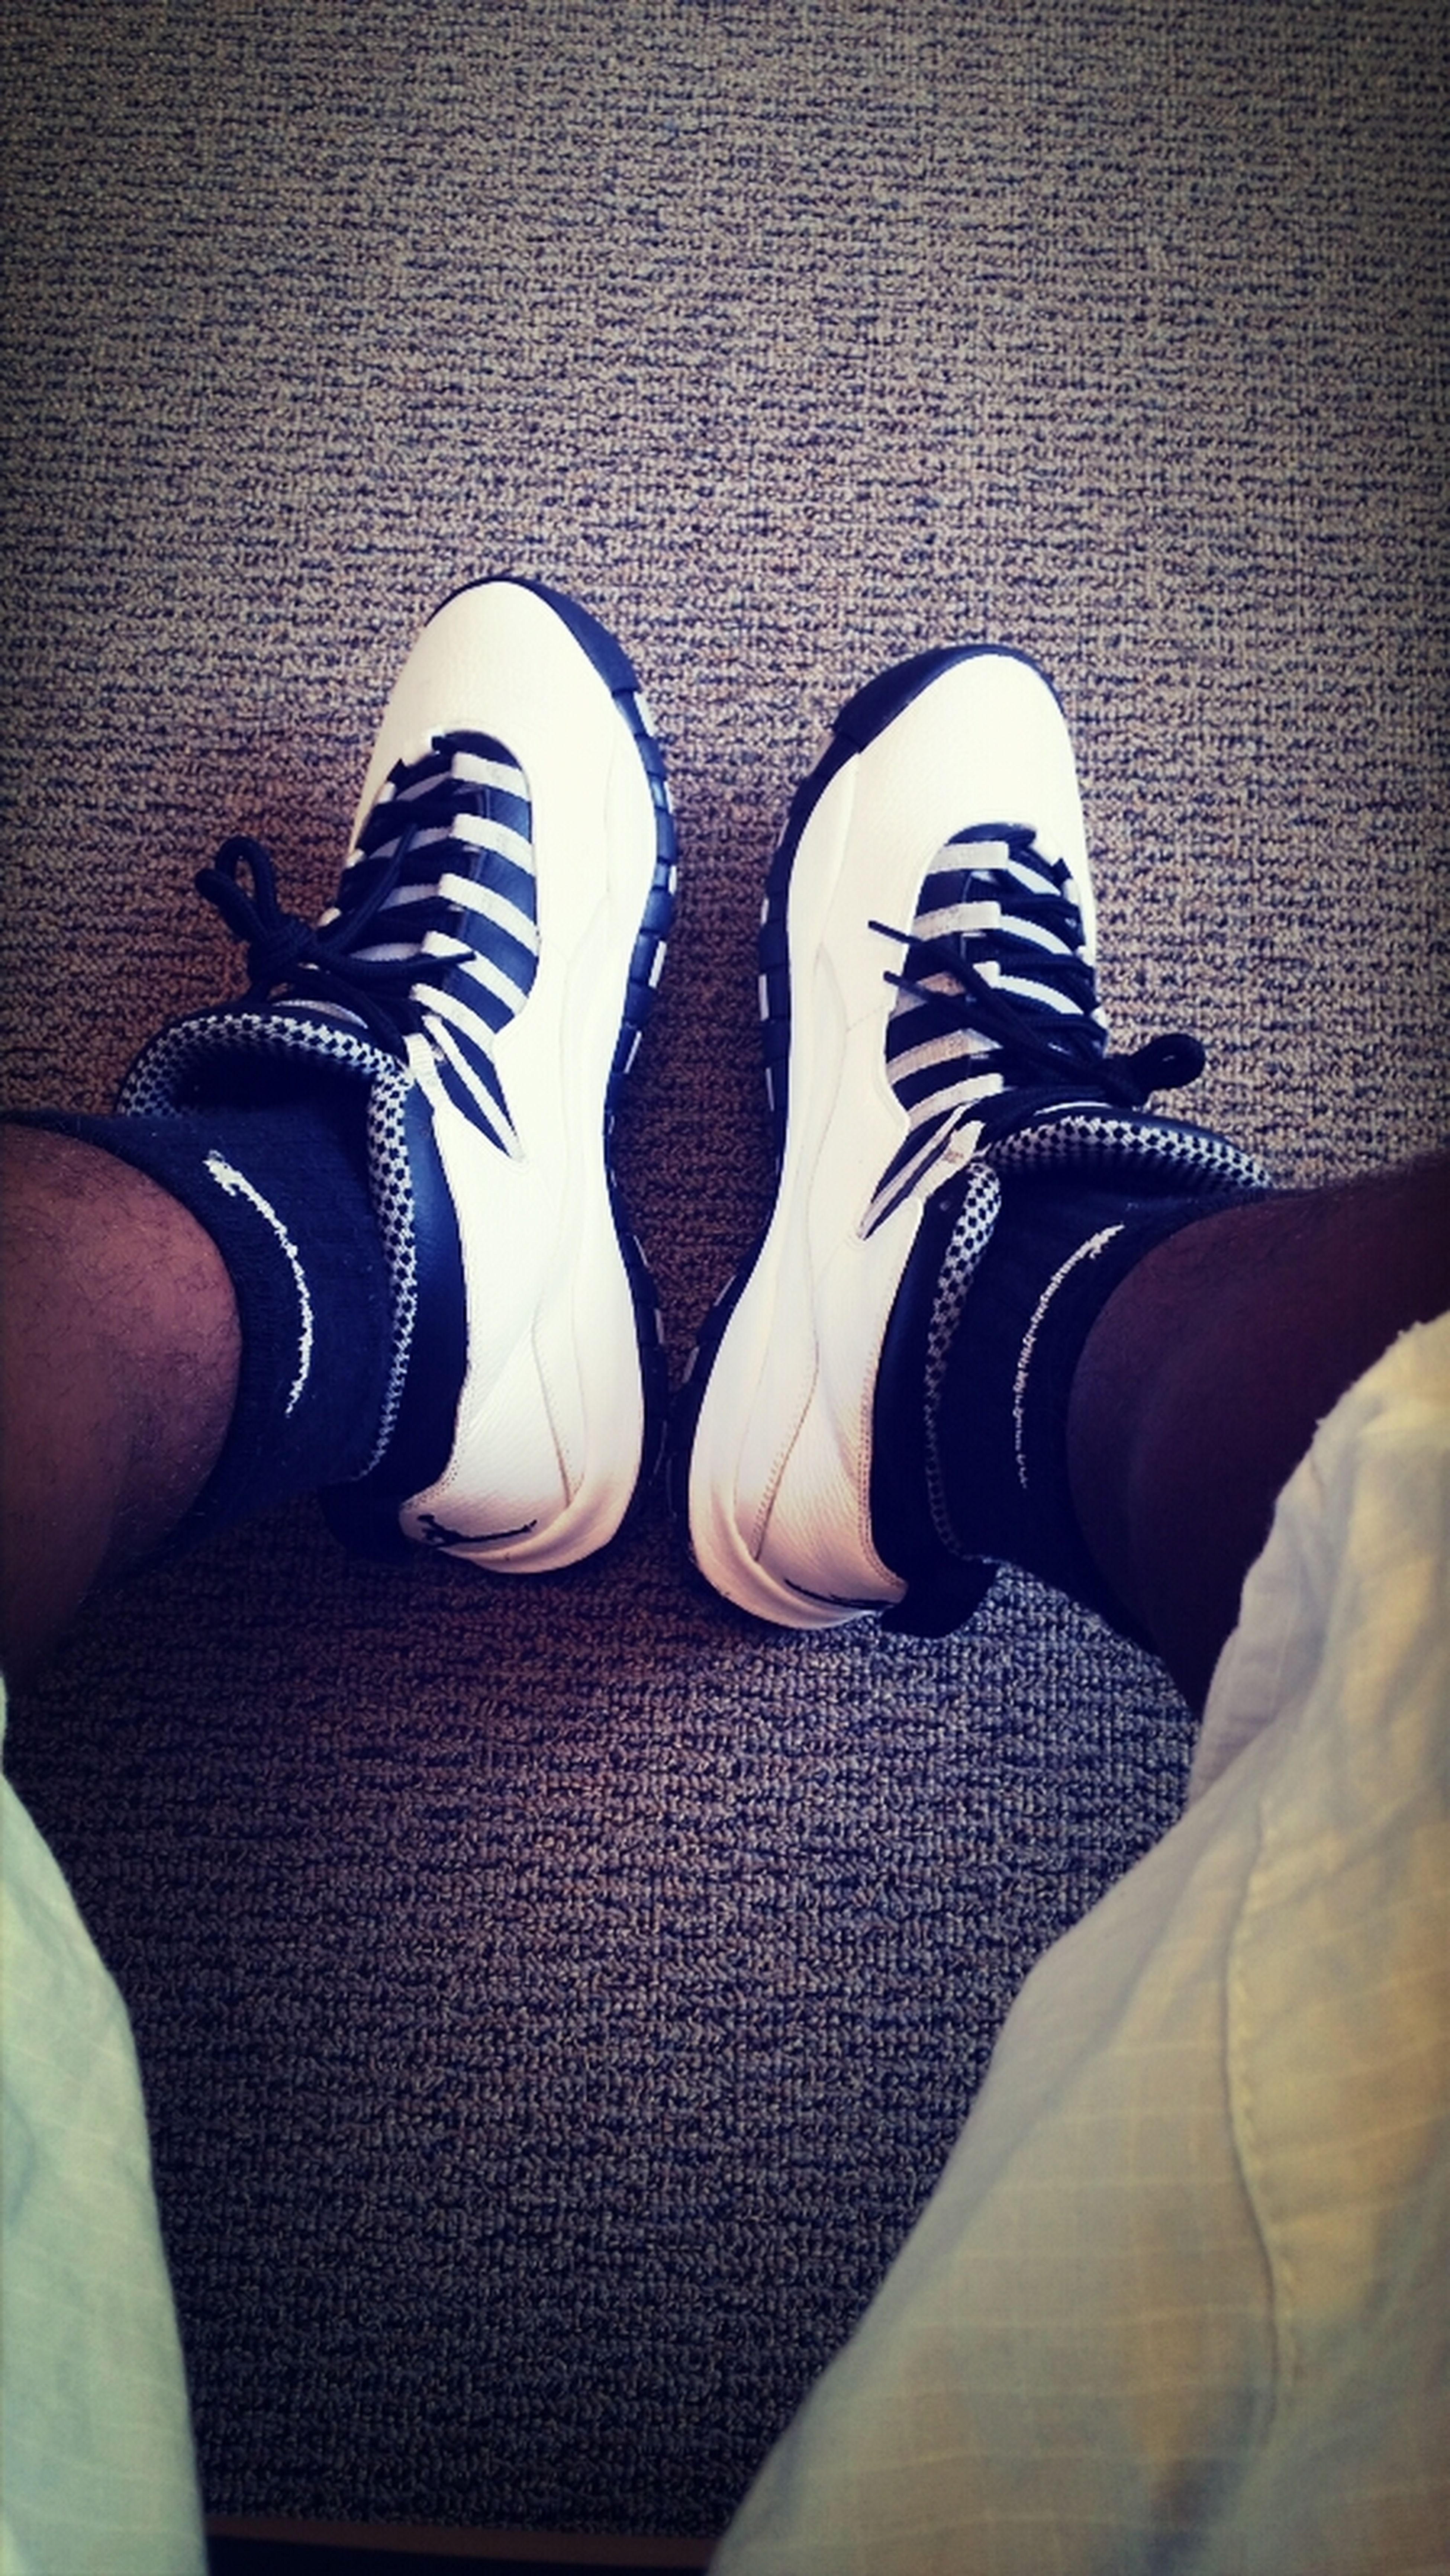 Kotd Steel Grey Jordans